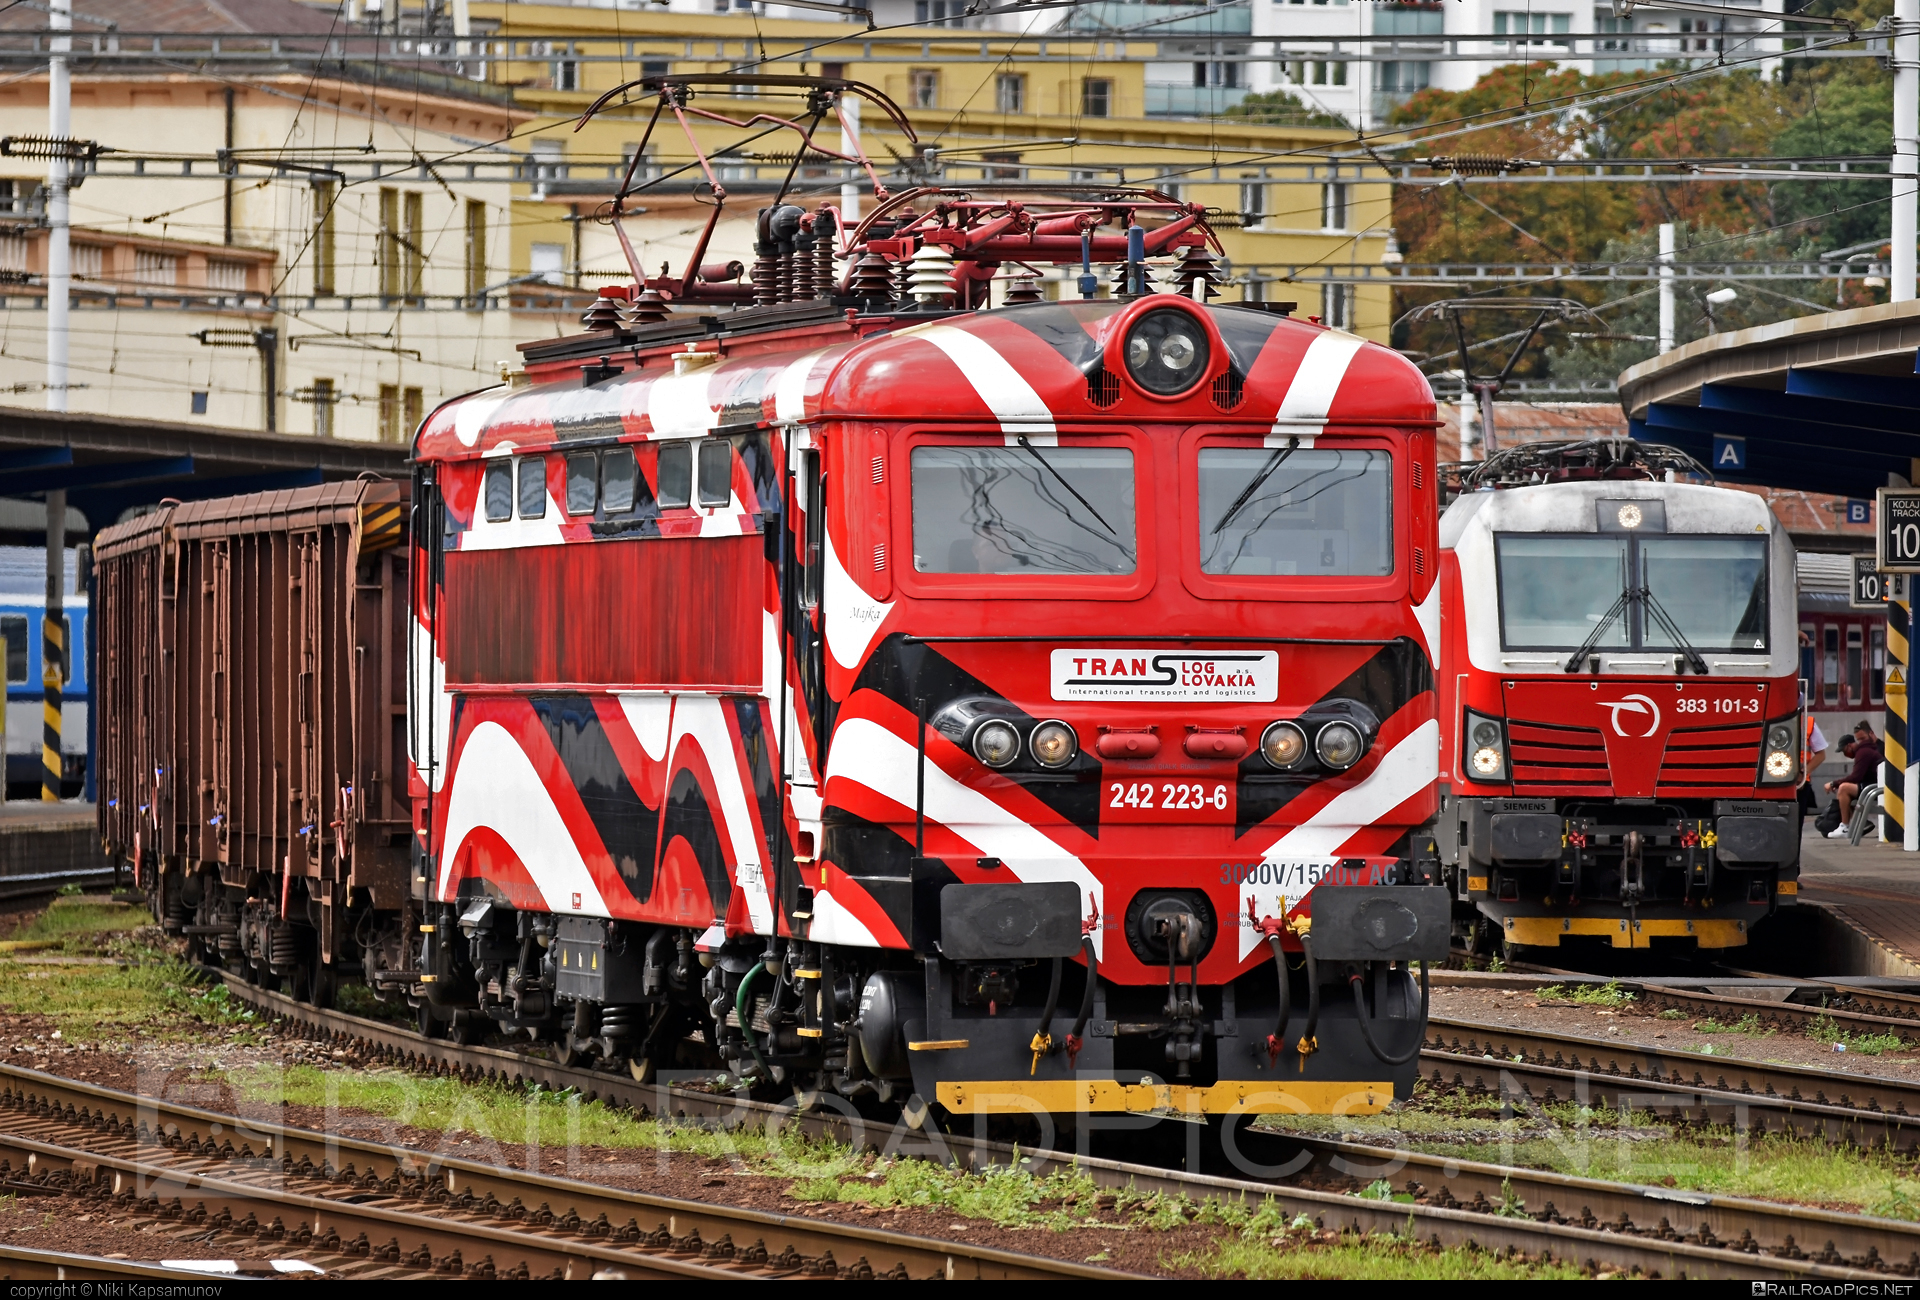 Škoda 73E - 242 223-6 operated by PETROLSPED Slovakia s.r.o. #locomotive242 #plechac #skoda #skoda73e #tlssk #translog #translogslovakia